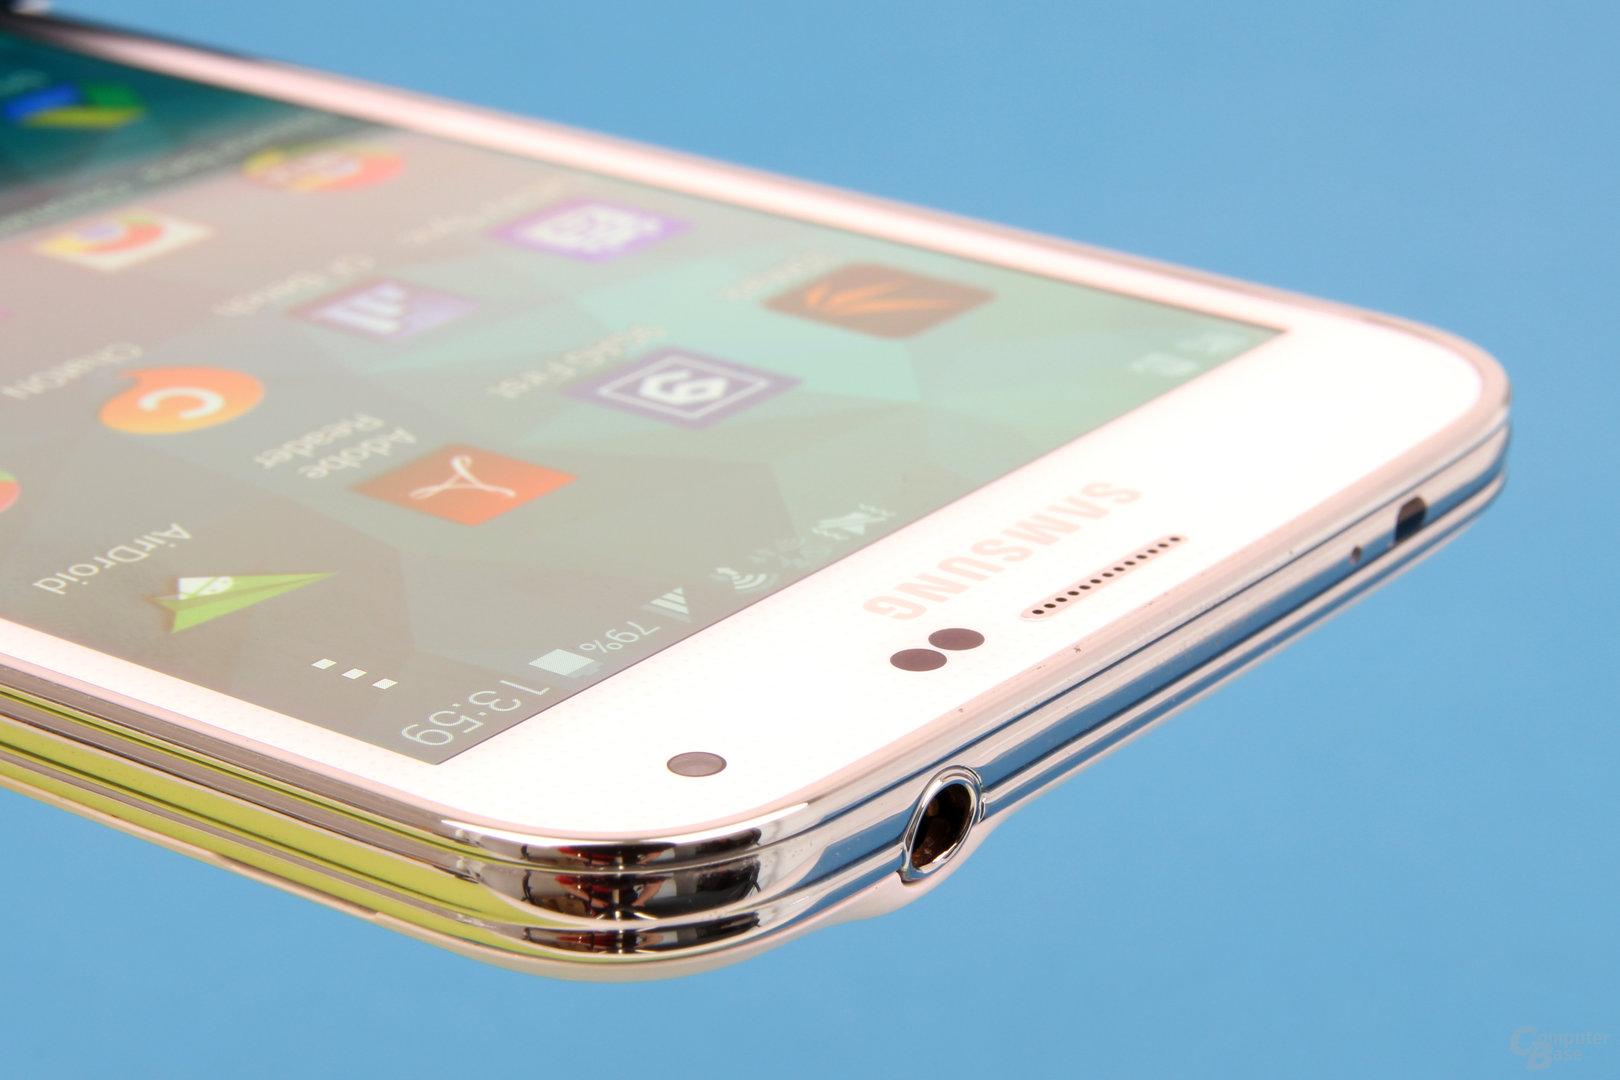 Samsung Galaxy S5: Chrom-Nachbildung aus Plastik